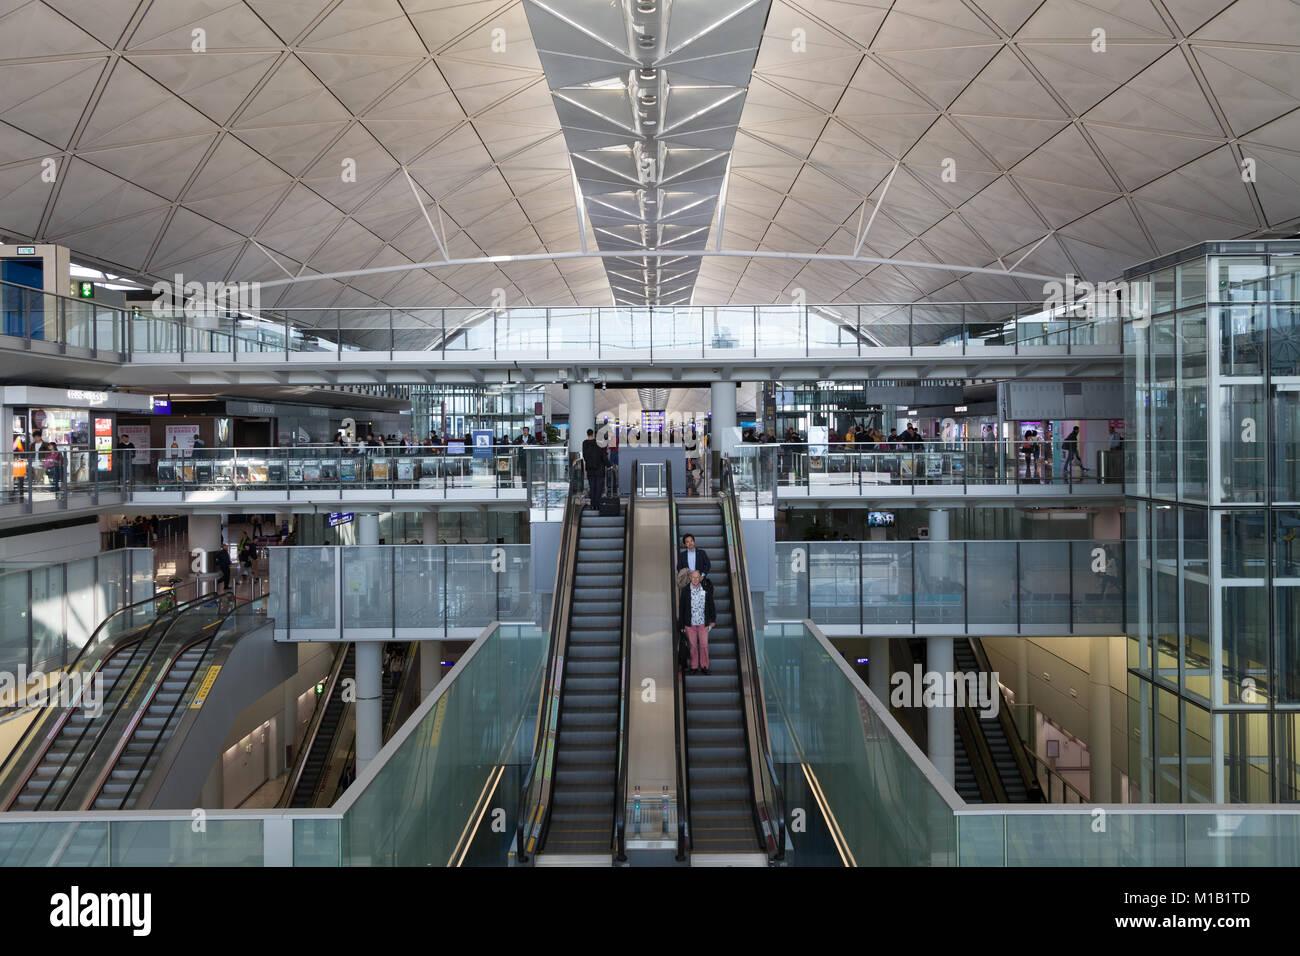 The departure terminal at Chek Lap Kok International Airport in Hong Kong, China. Thursday January 11th 2018 - Stock Image